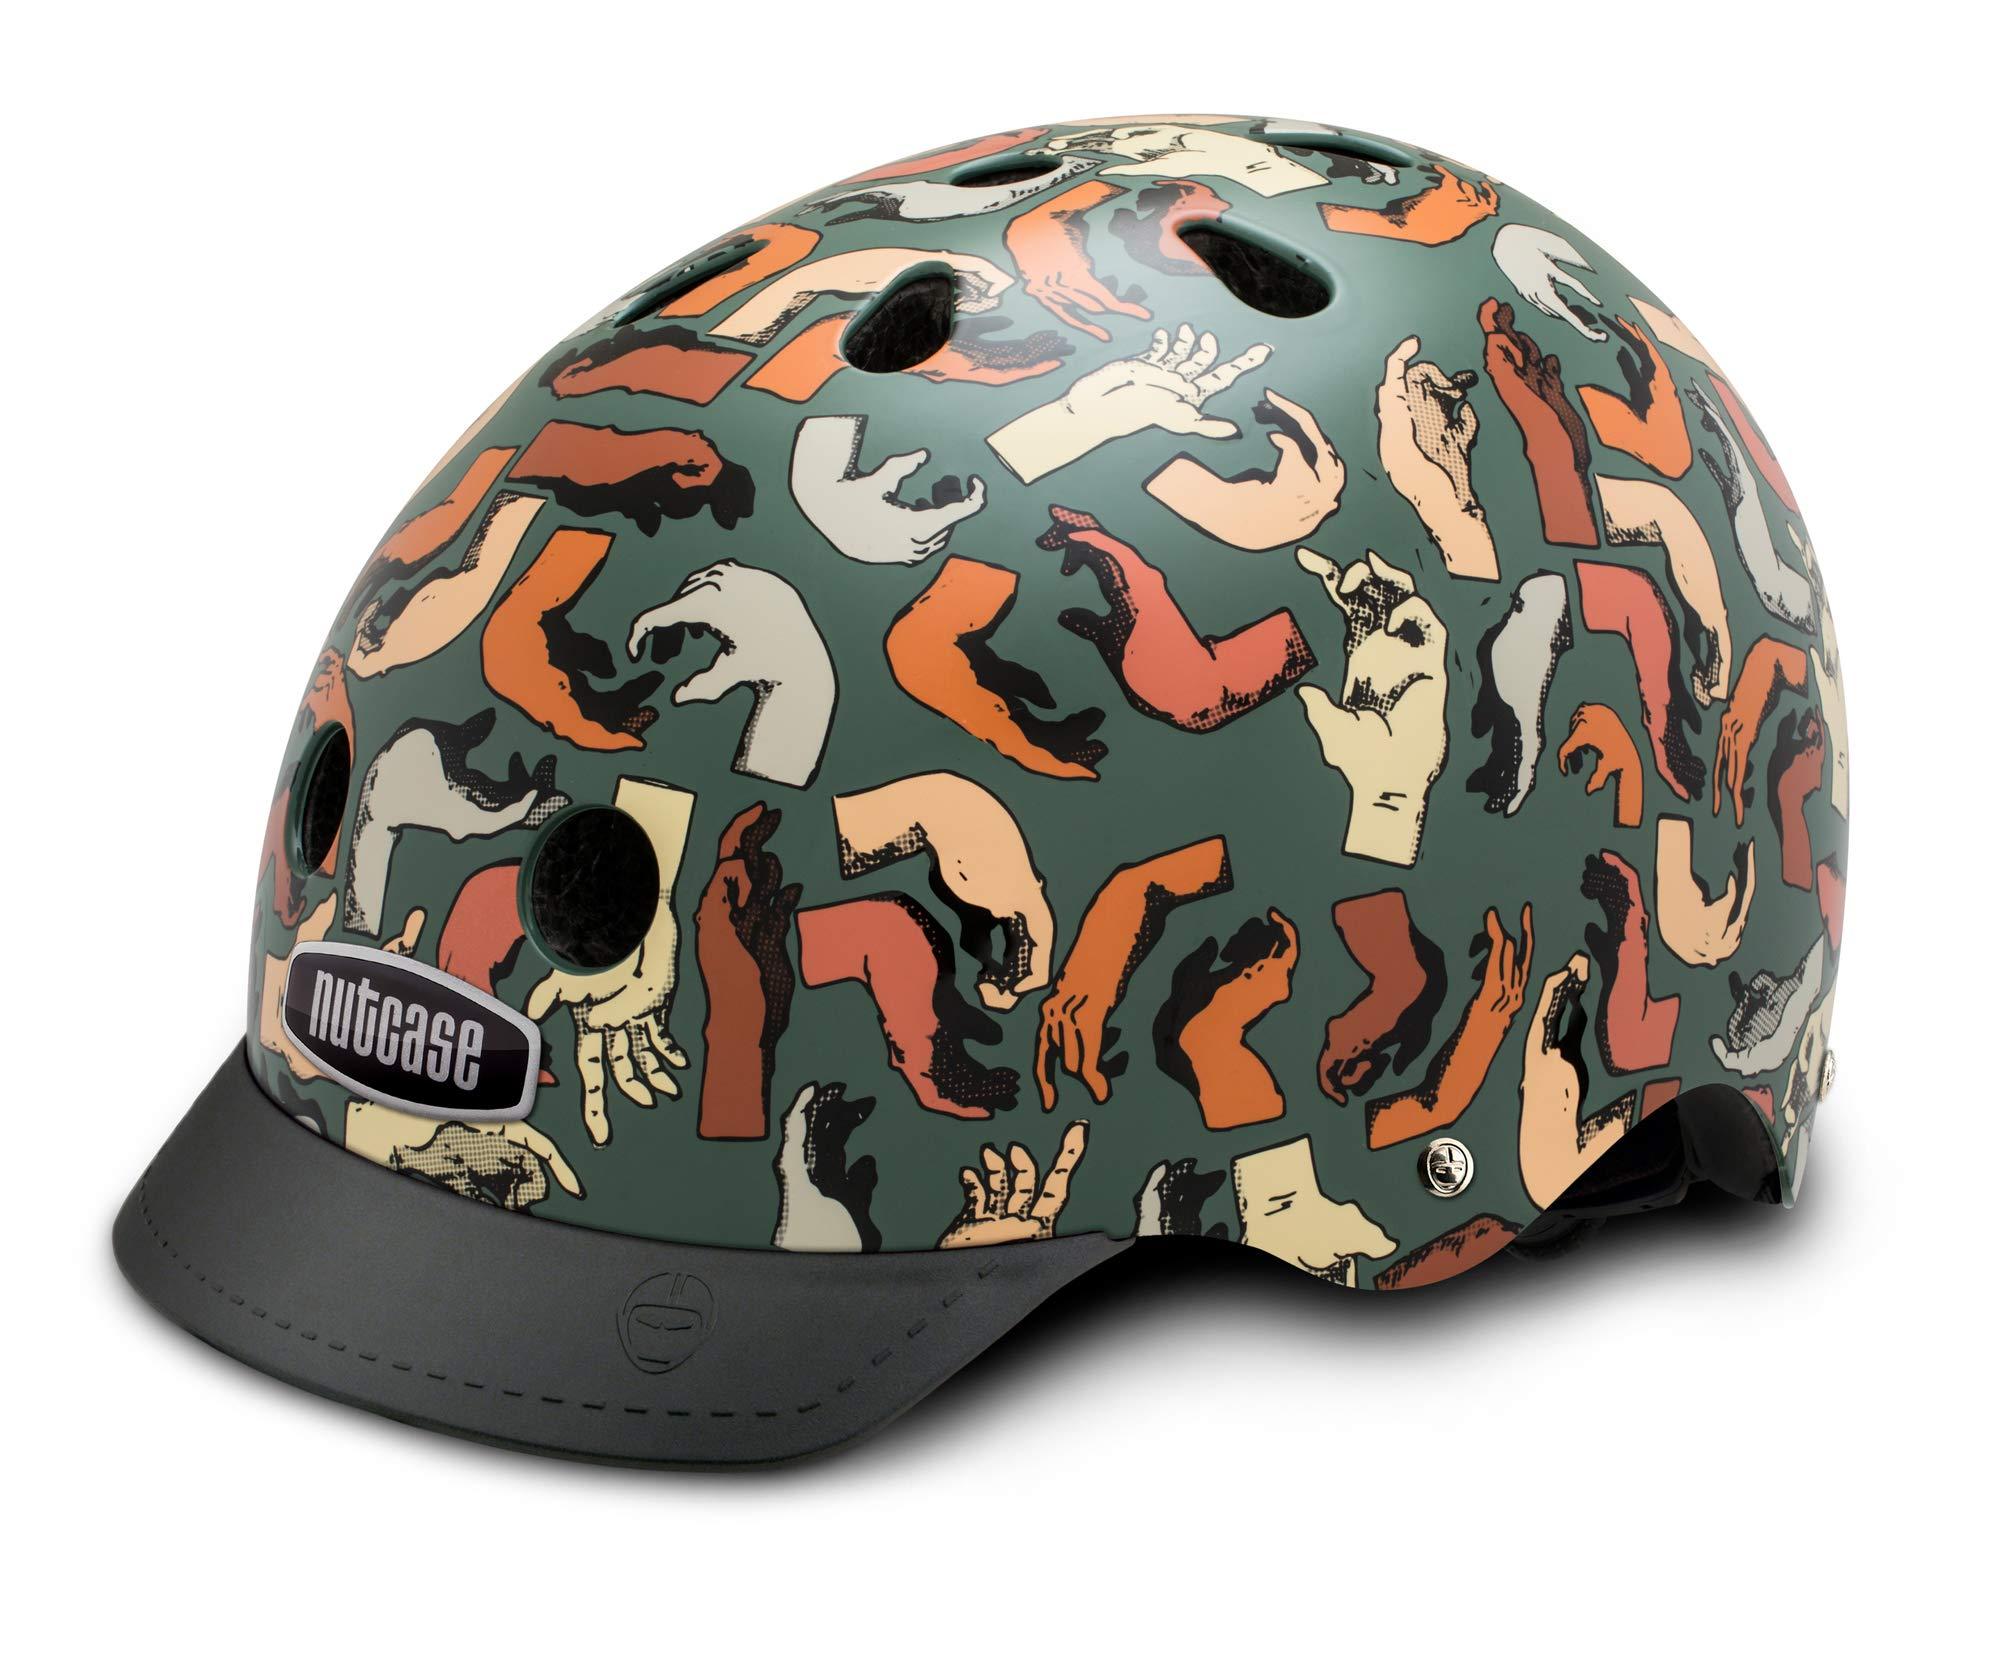 Nutcase - Patterned Street Bike Helmet for Adults, Handy Medley, Medium